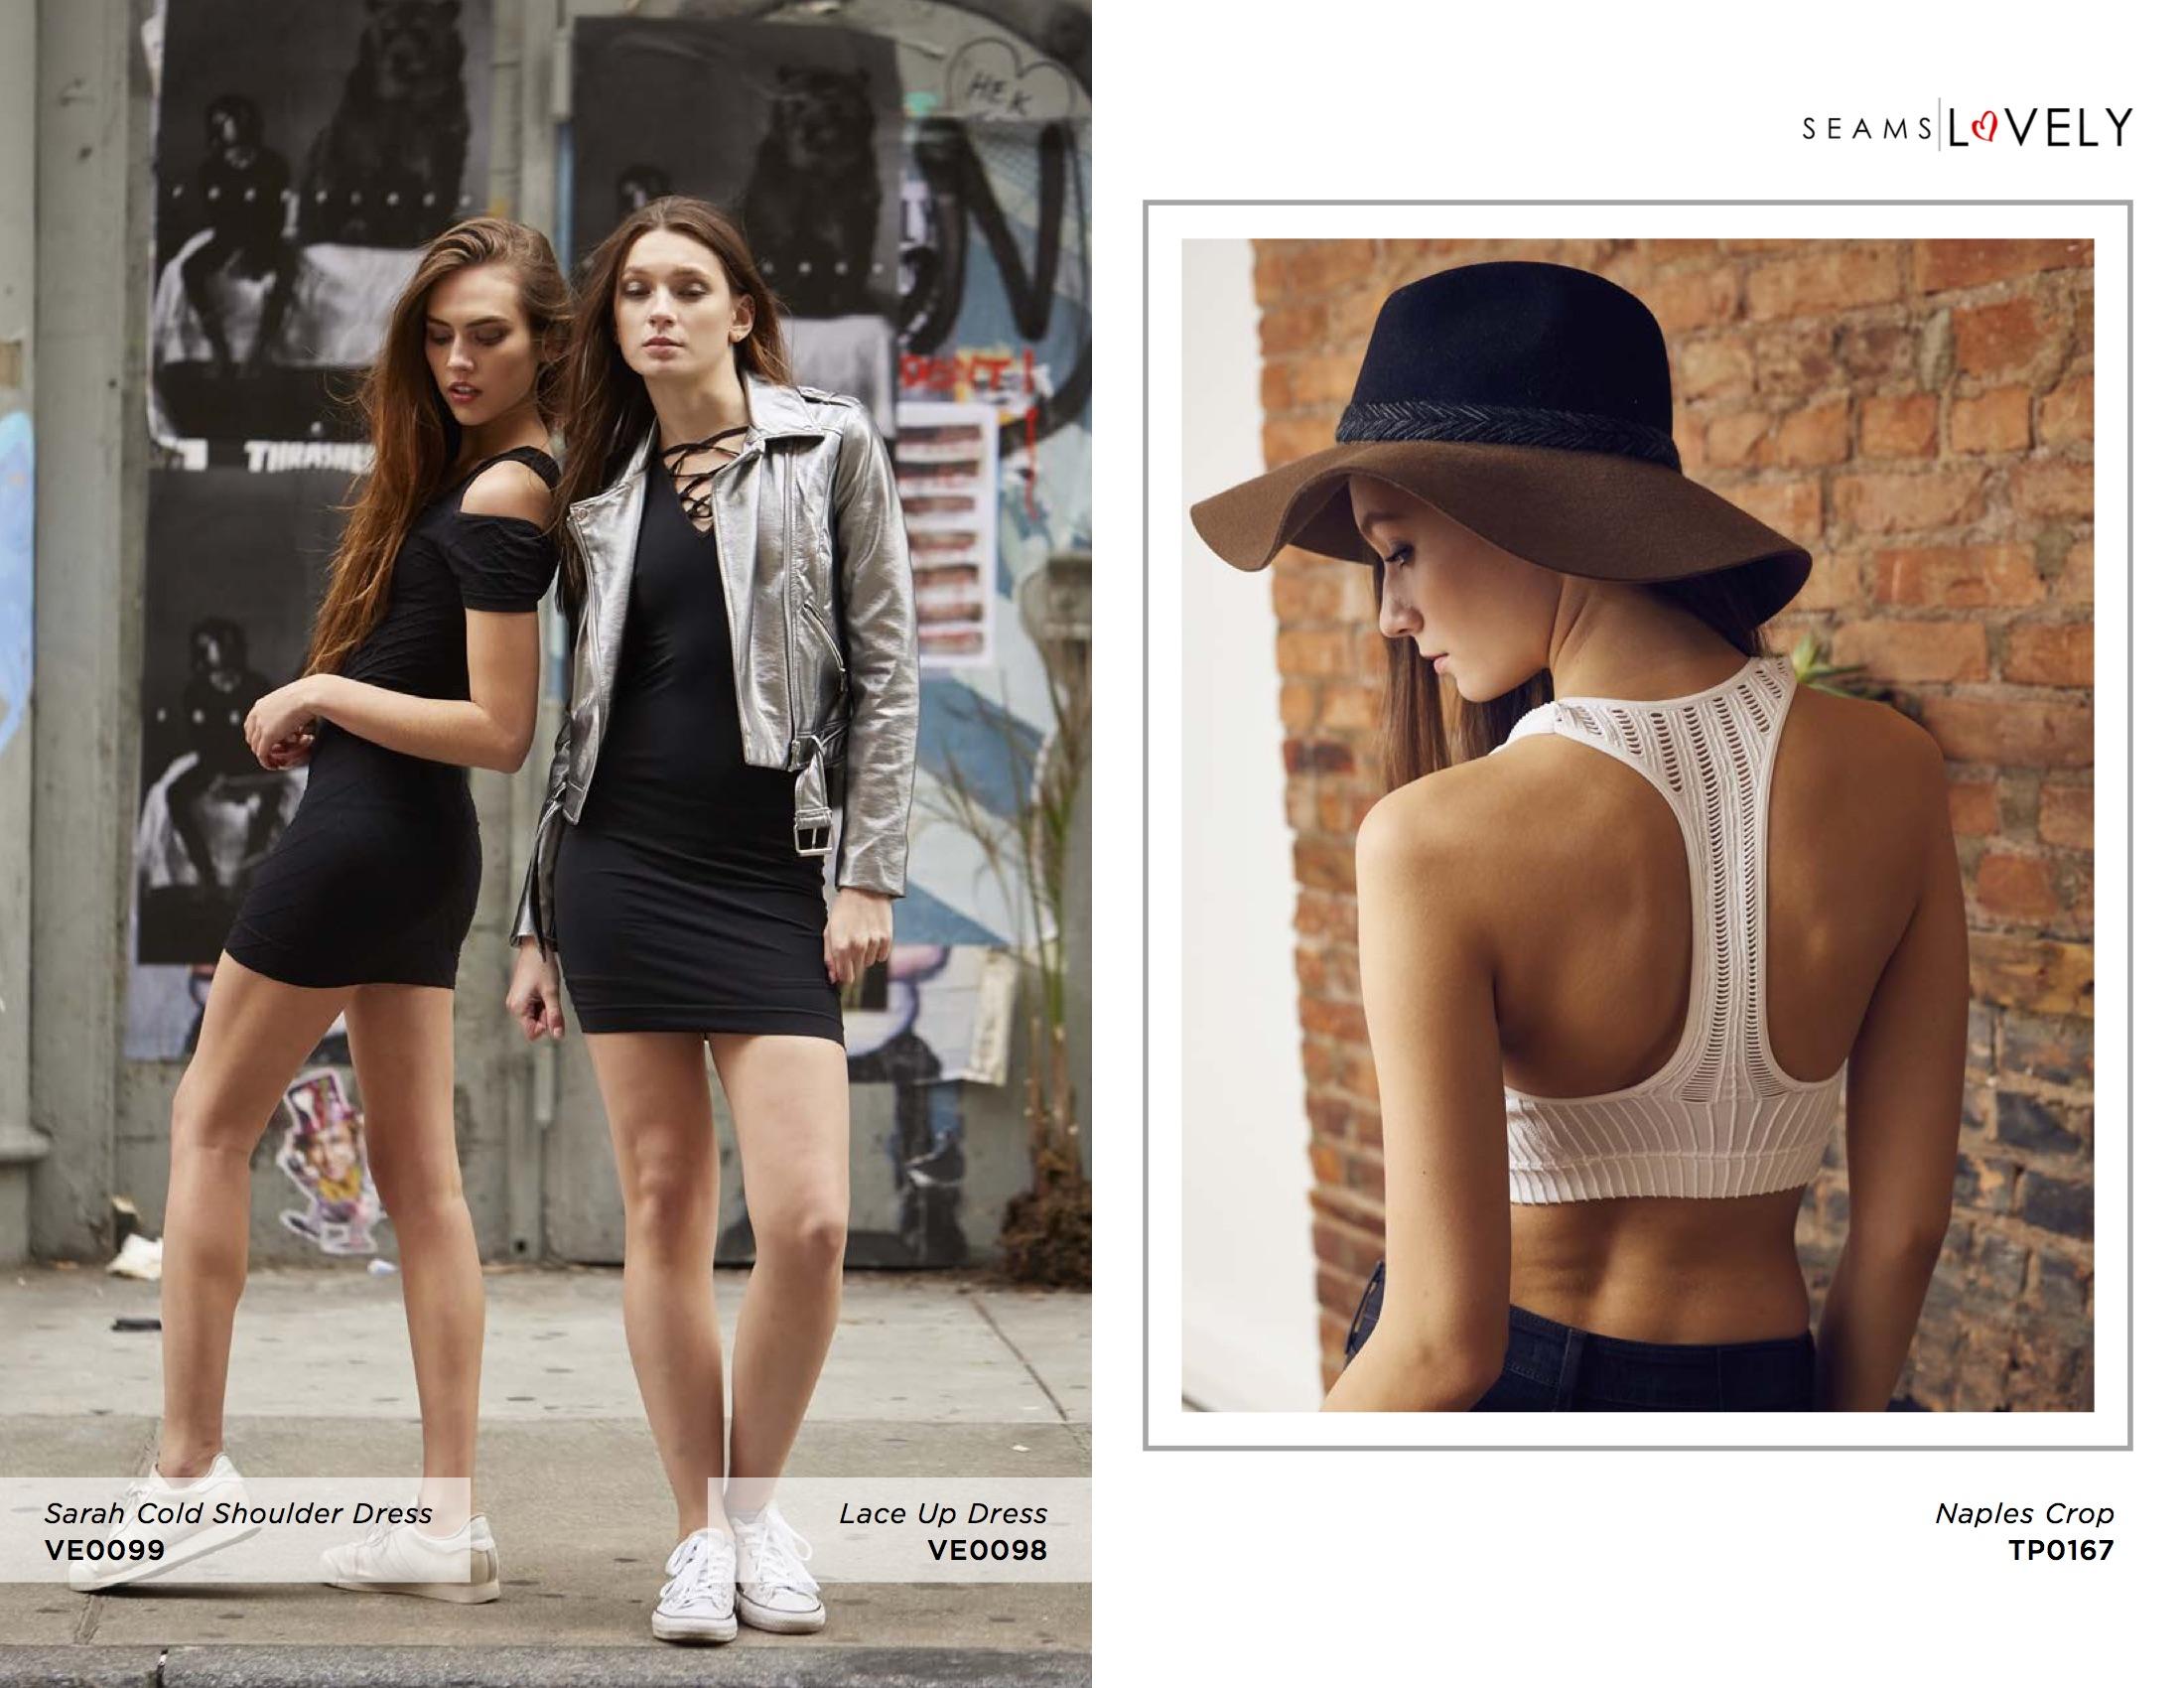 SeamsLovely_LookBook_Spring17 (dragged) 9.jpg